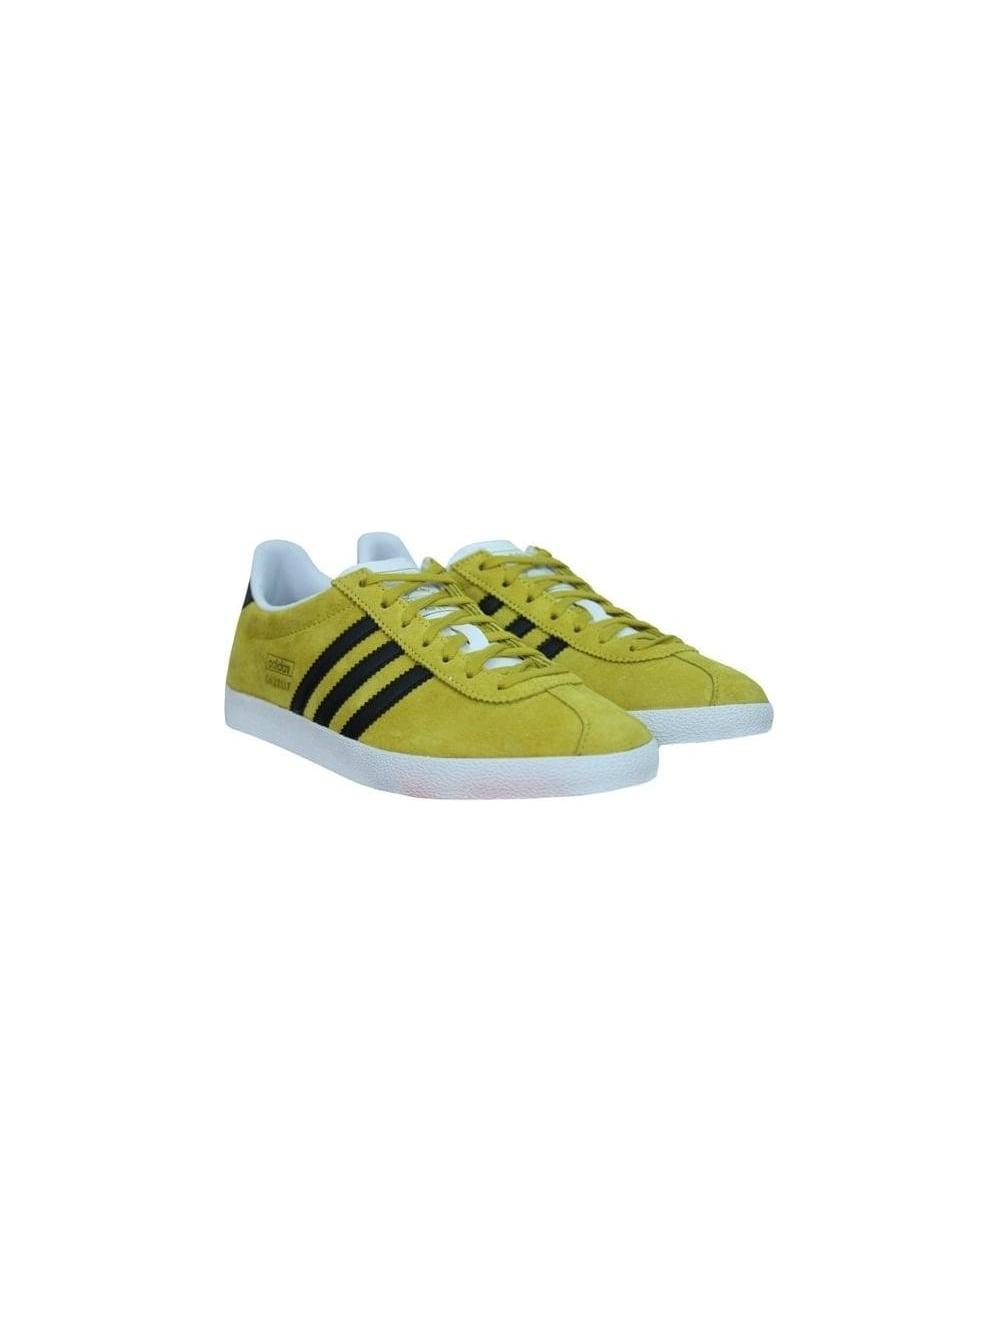 adidas gazelle og yellow